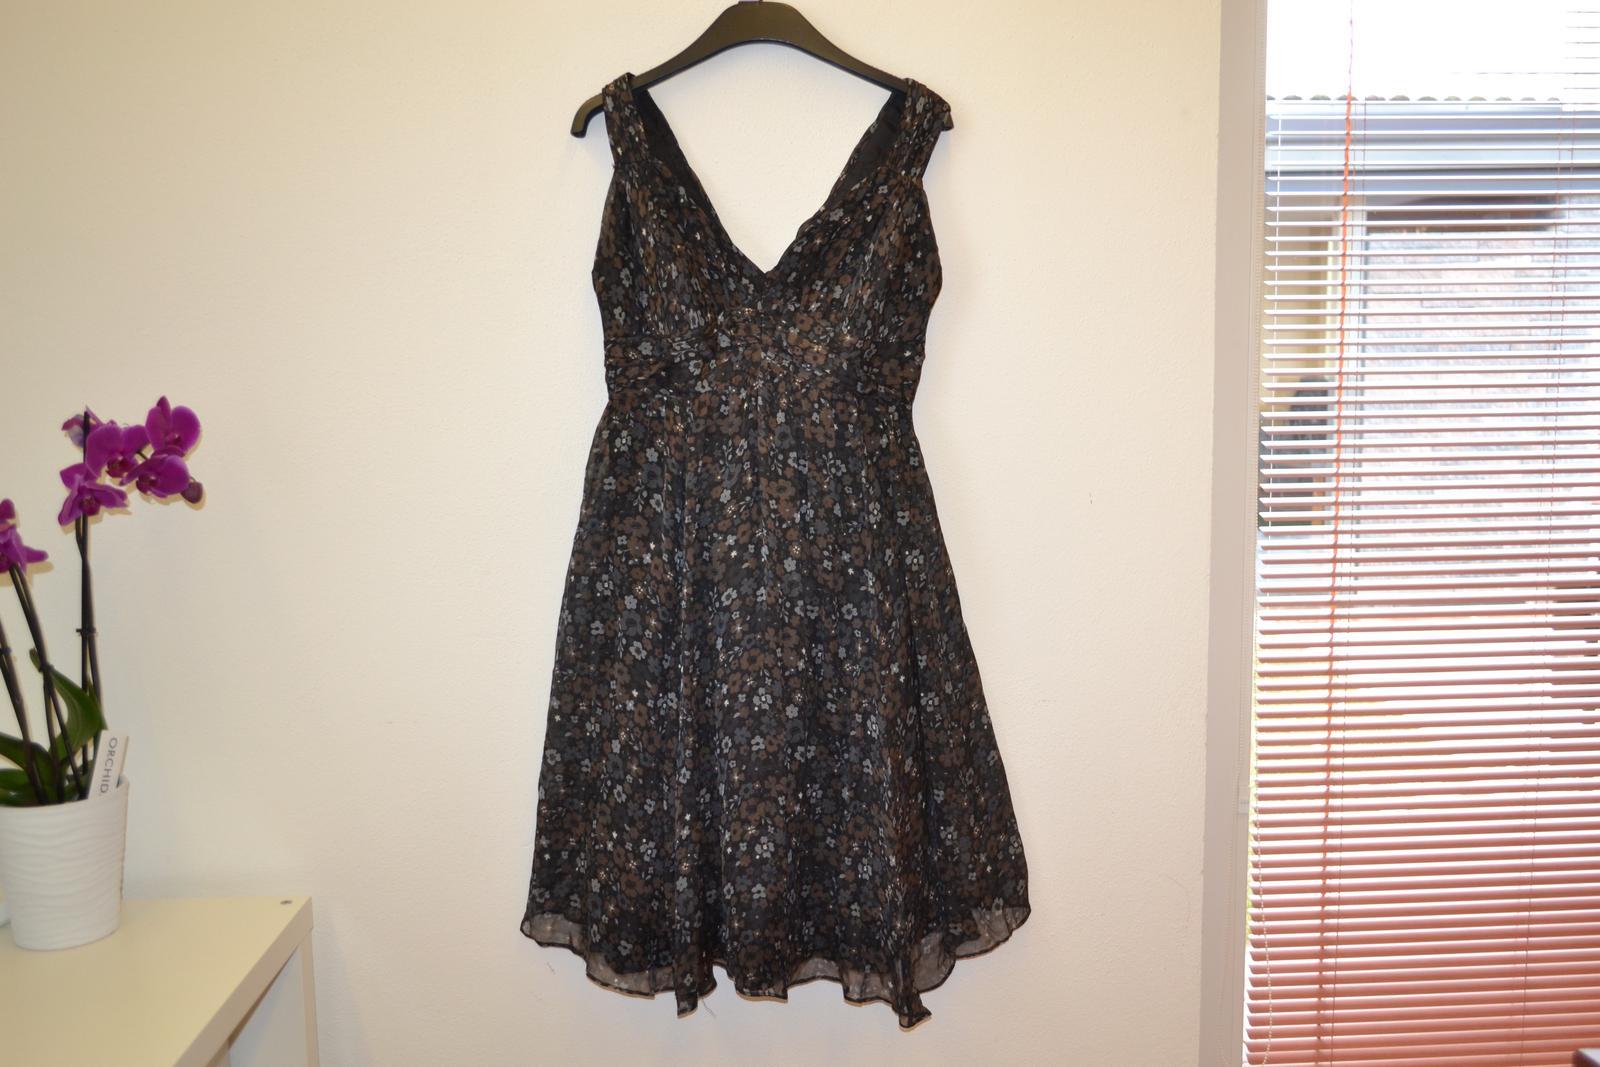 Hedvábné šaty zn. Zara top stav - Obrázek č. 2